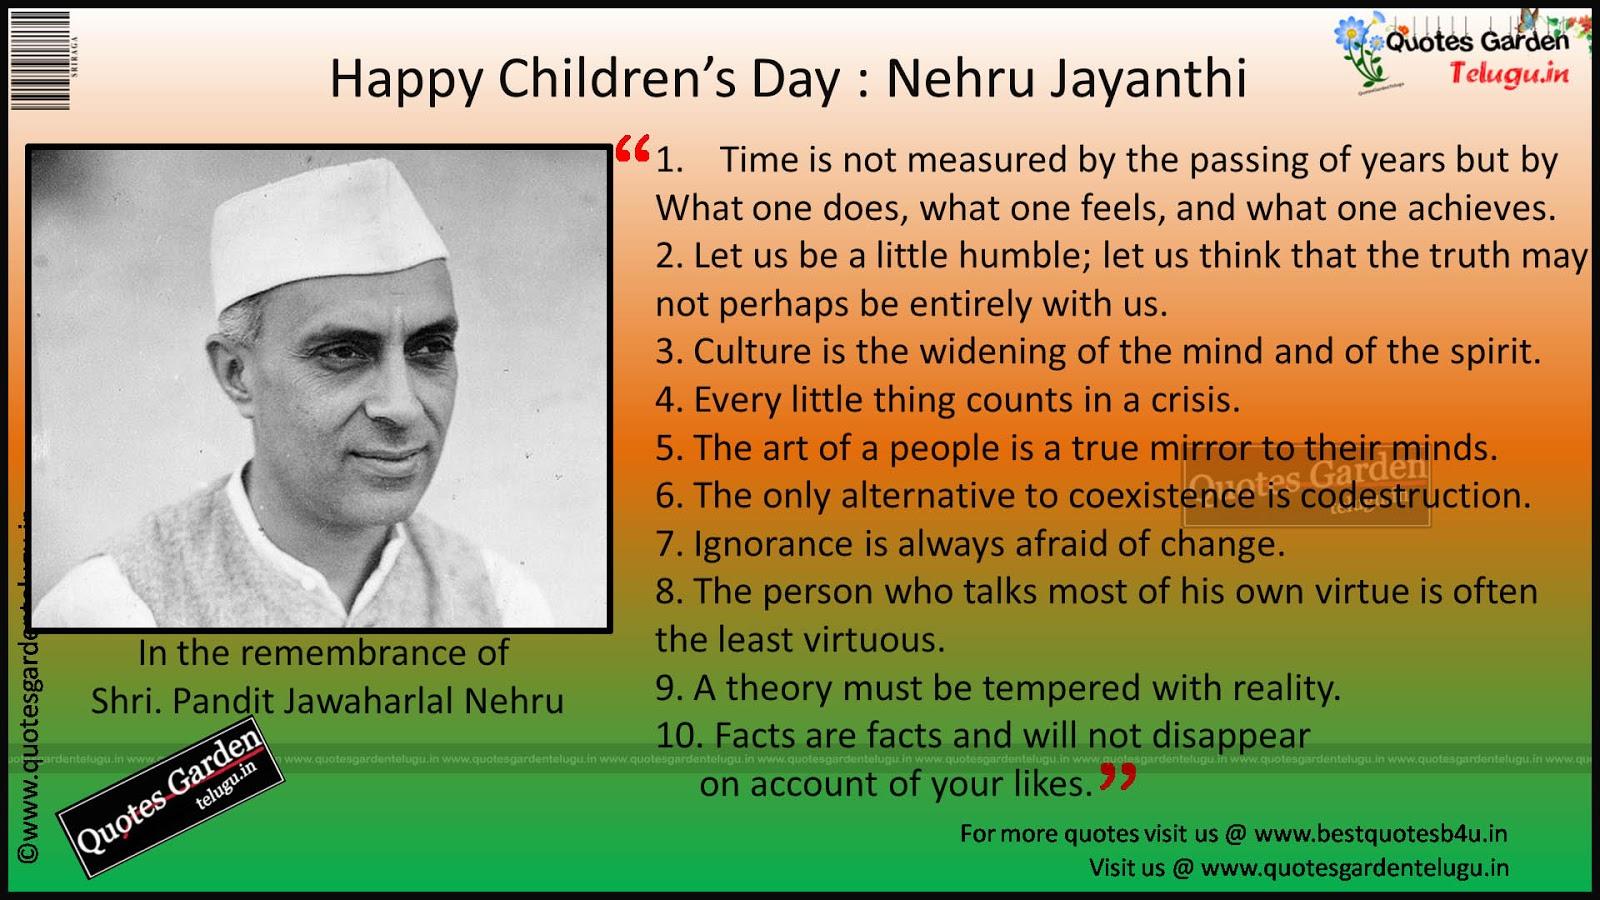 jawaharlal nehru biography in telugu free essays   berita baru dot    essay jawaharlal nehru happy childrens day greetings quotations